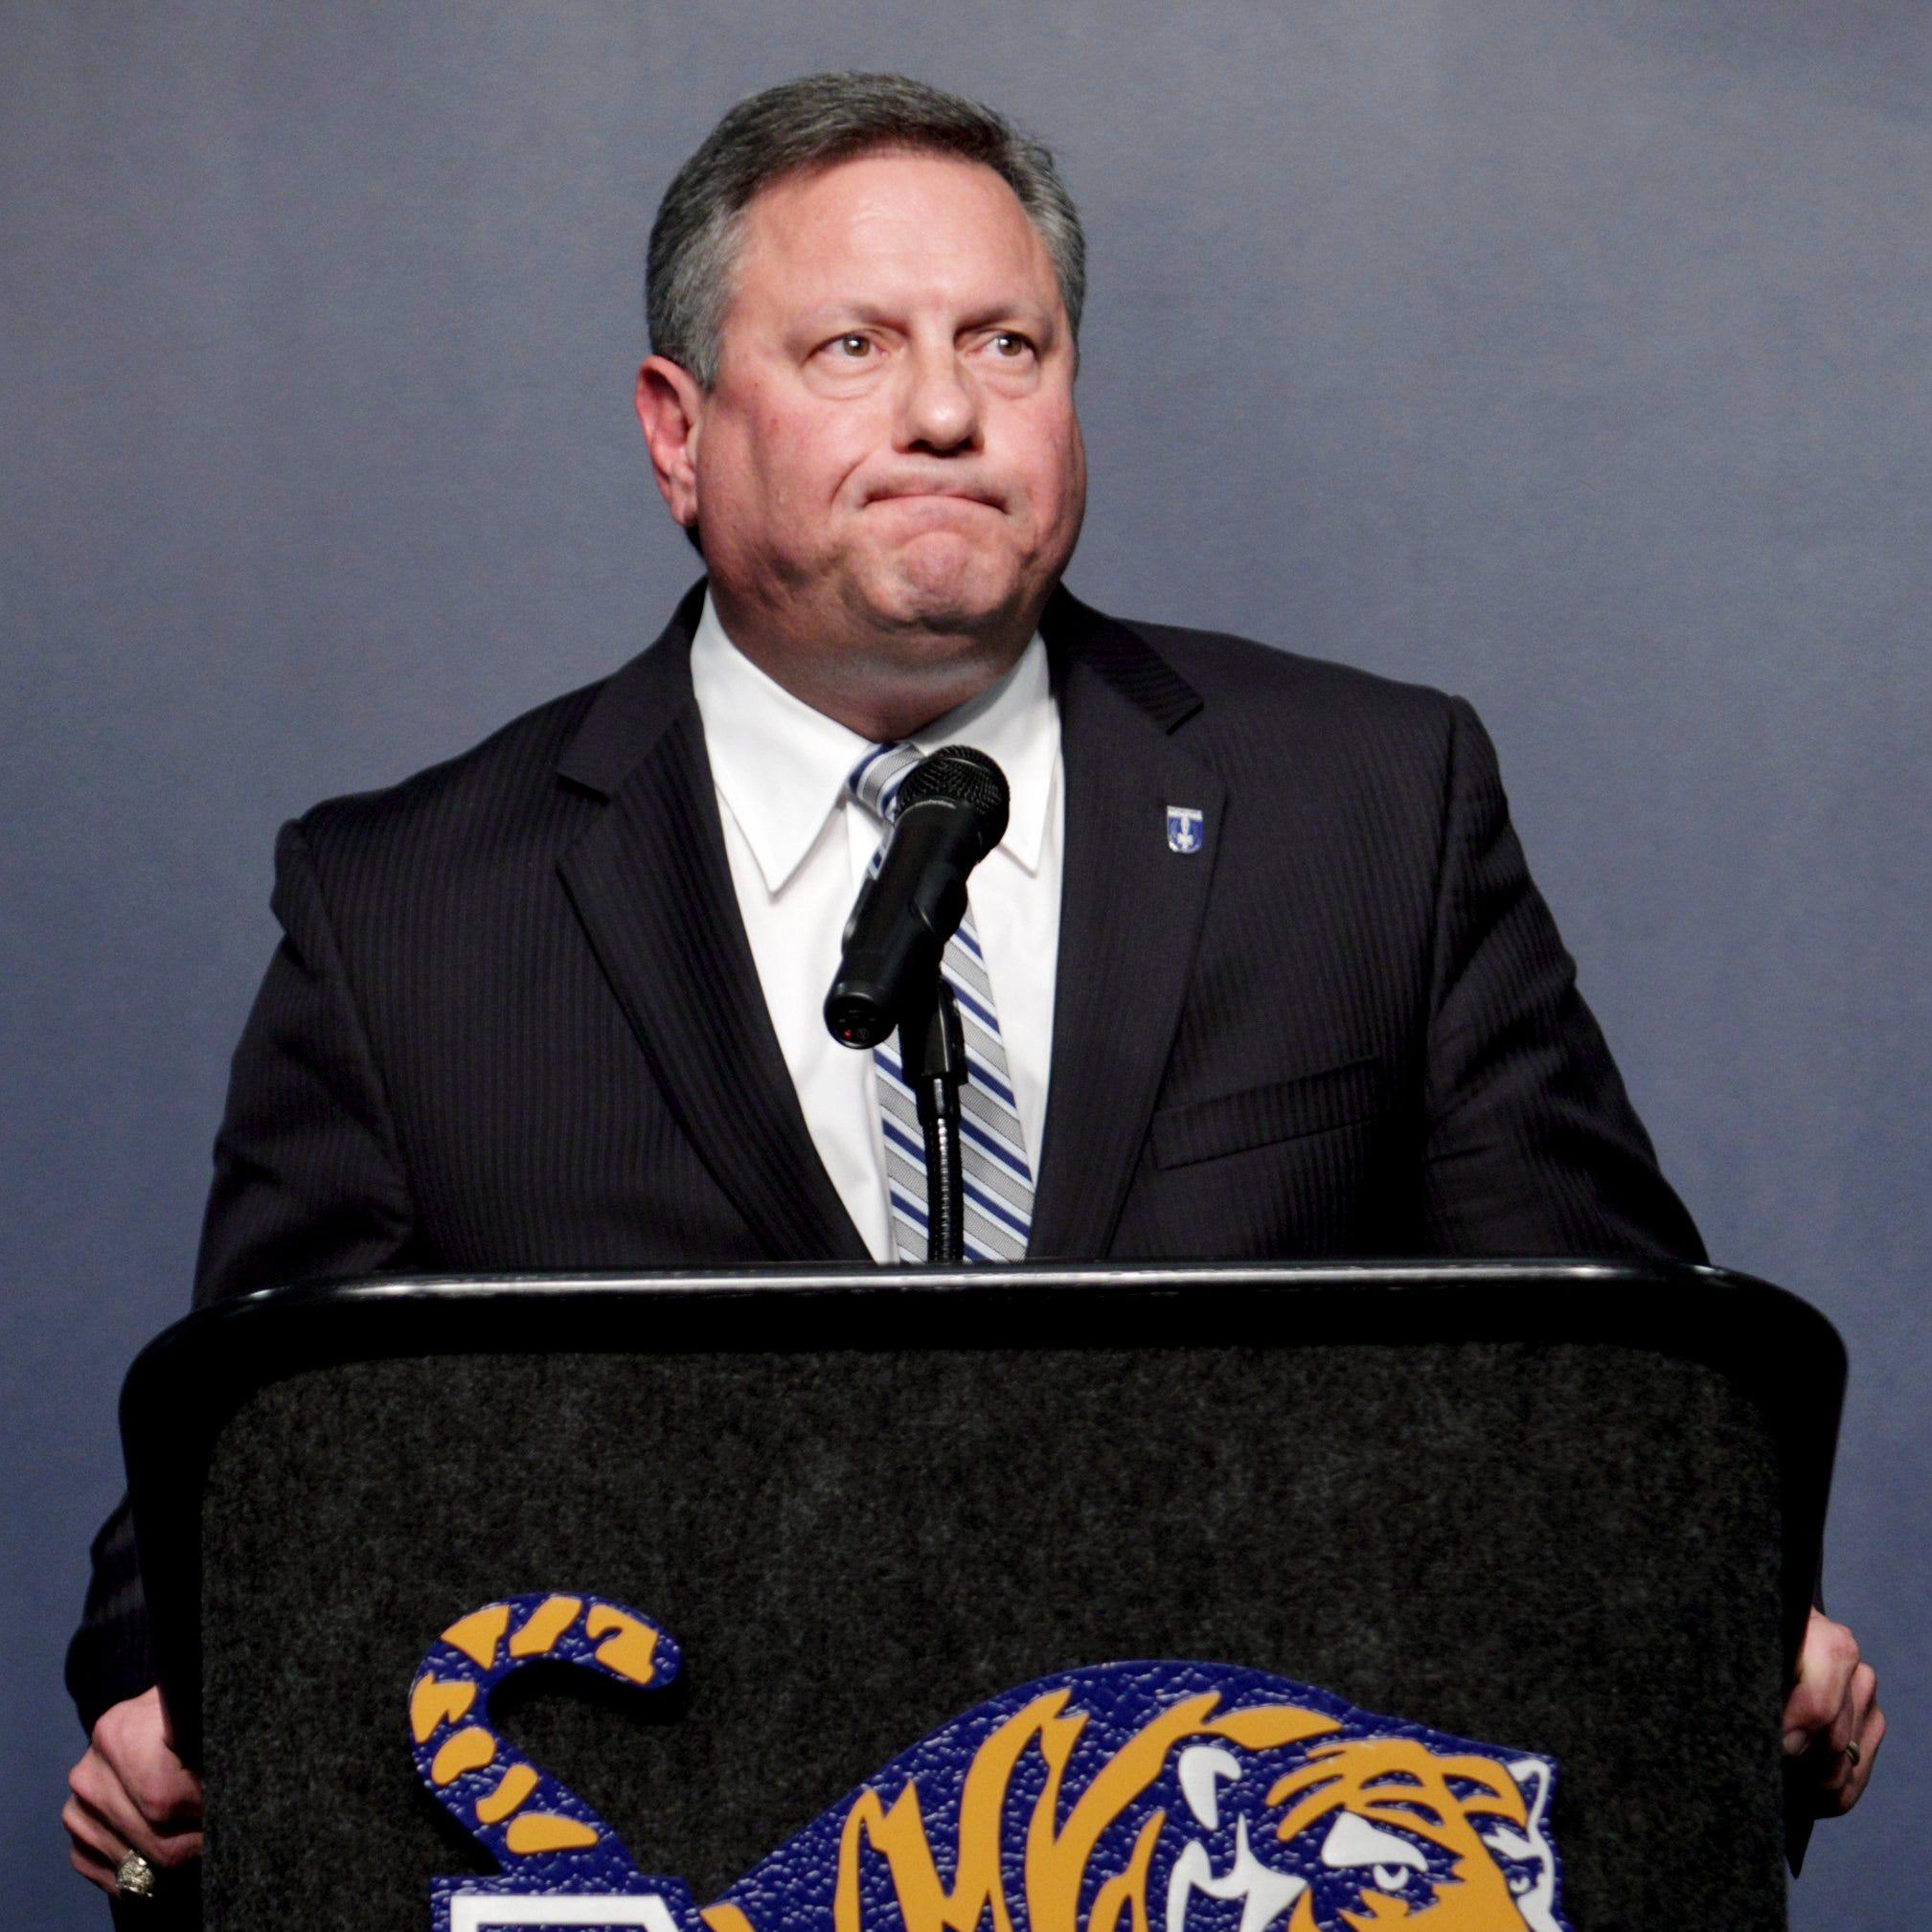 University of Memphis releases unredacted letter alleging unprofessional behavior by former AD Tom Bowen